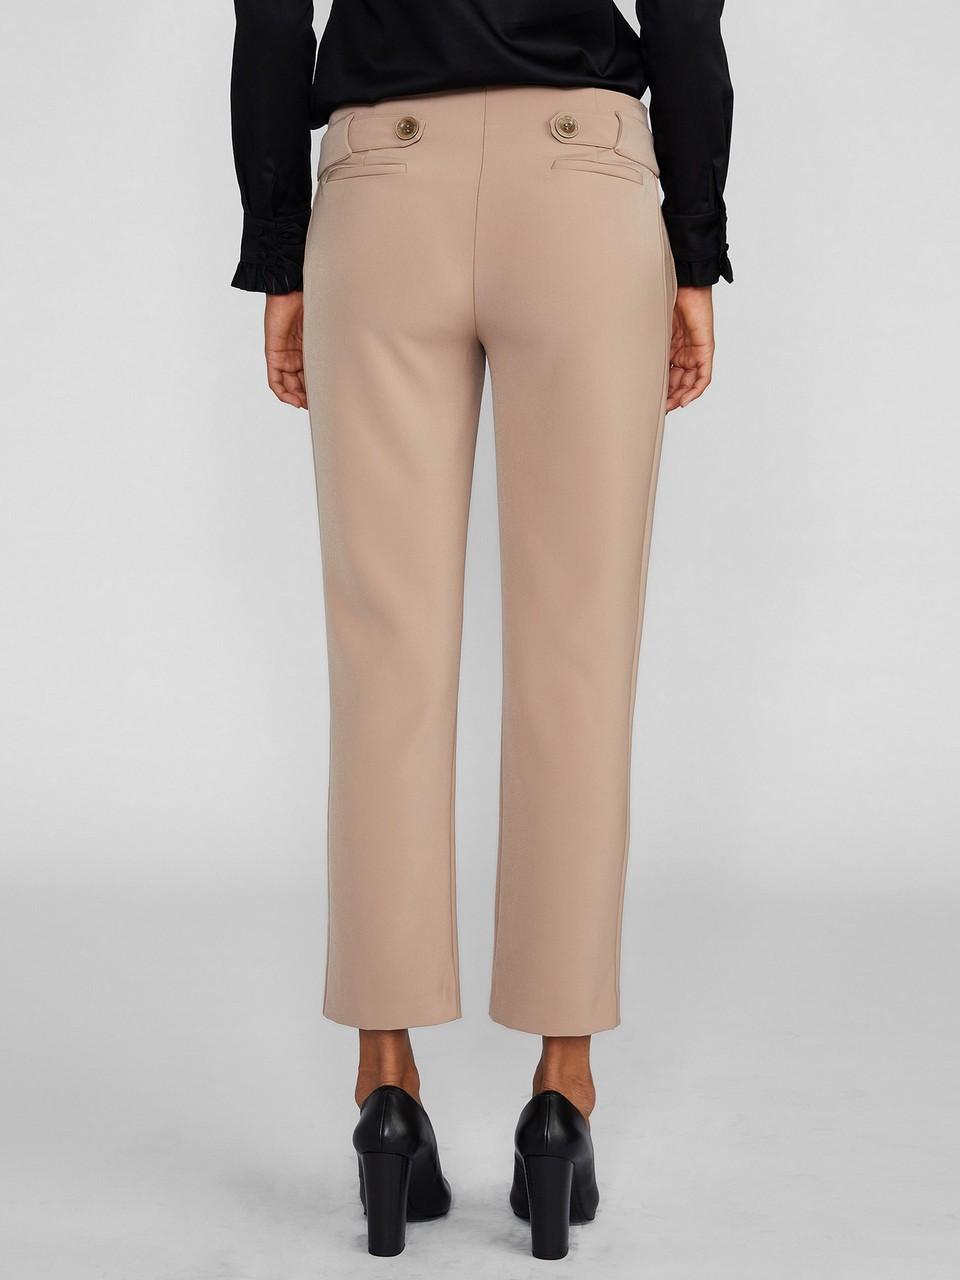 Kemer Detaylı Klasik Kesim Pantolon